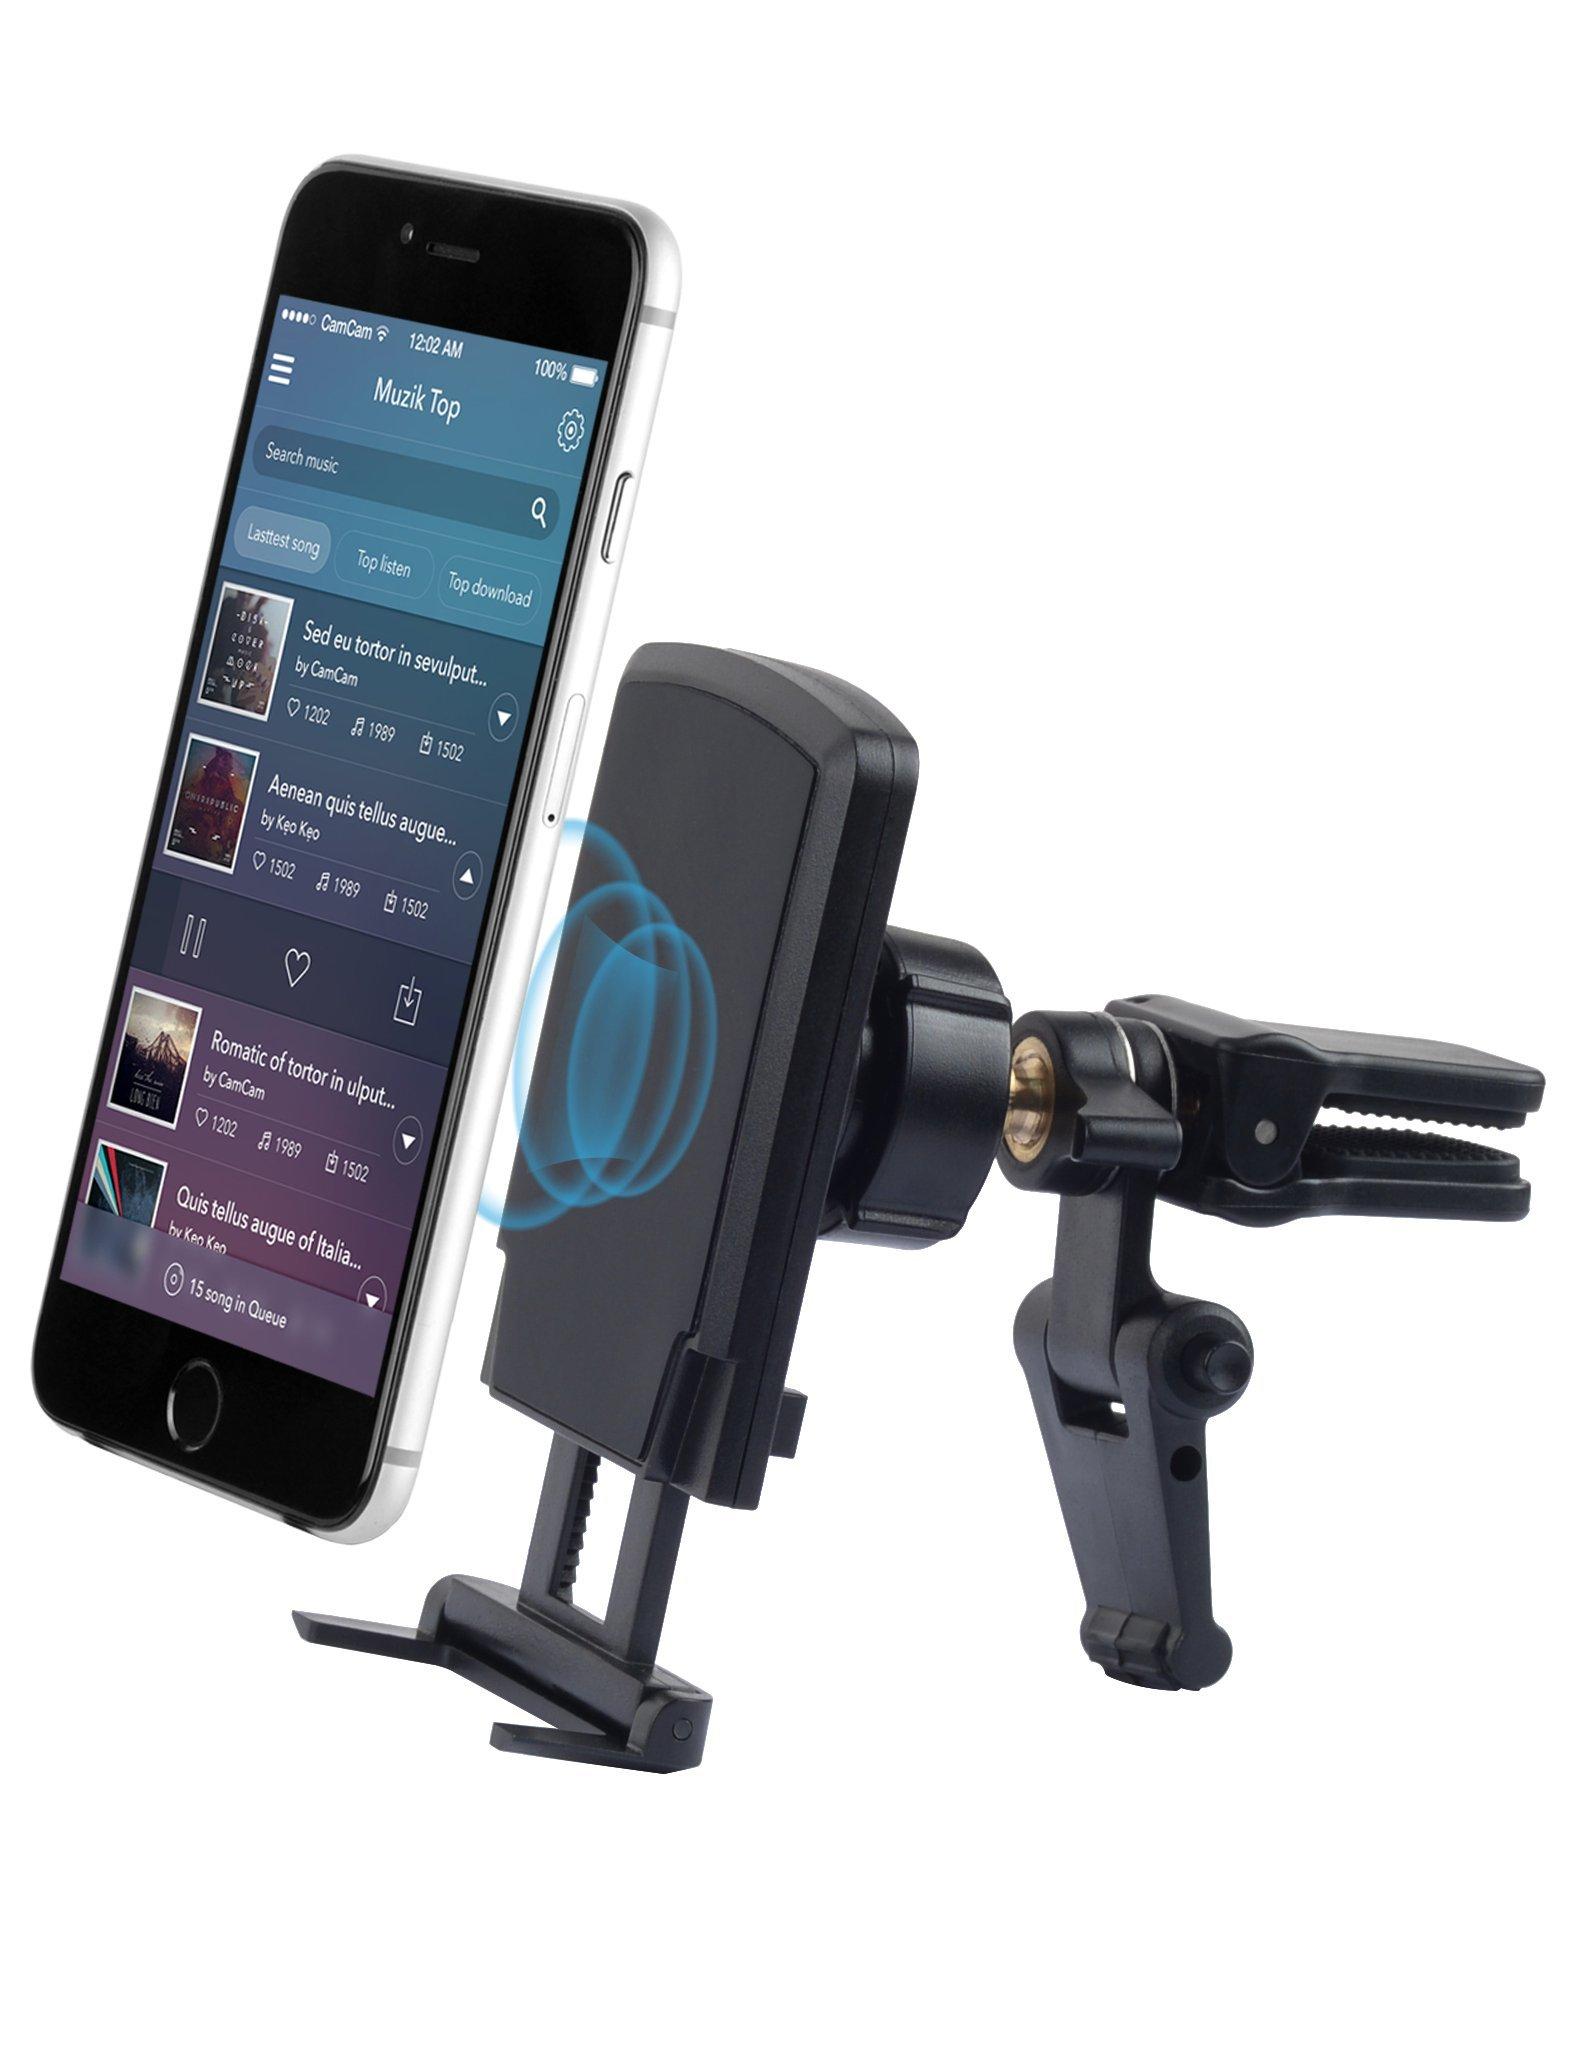 Black Smartecoo 0608473930574 Kawany Car Mount Holder for Phones Air Vent Magnetic Hexa Neodymium Core Car Mount Car Mount Phone Holder for Galaxy S7 S6 Edge Note 5 4 LG G5 G4 iPhone 6 6S SE Plus Nexus 5X 6P More